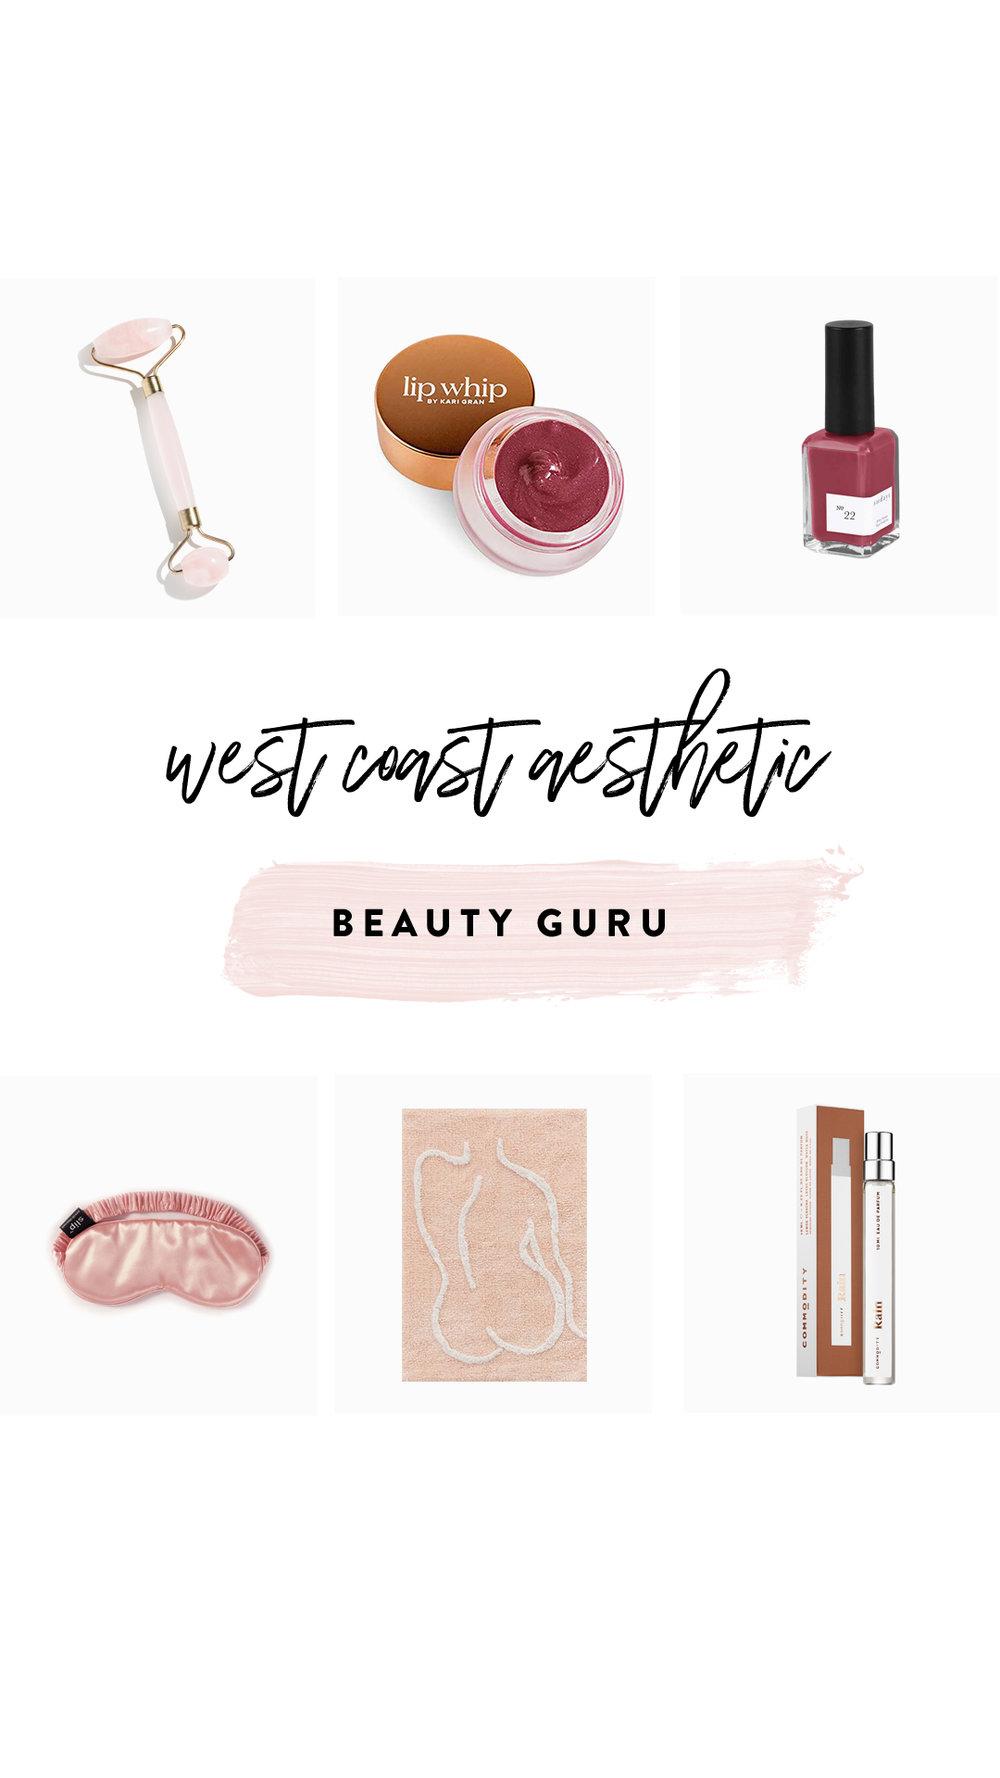 1.   Rose Quartz Roller   | 2.   Lip Whip   | 3.   Sundays Nail Polish   | 4.   Silk Sleeping Mask   | 5.   Bath Mat     | 6.   Commodity Perfume (Travel Size)